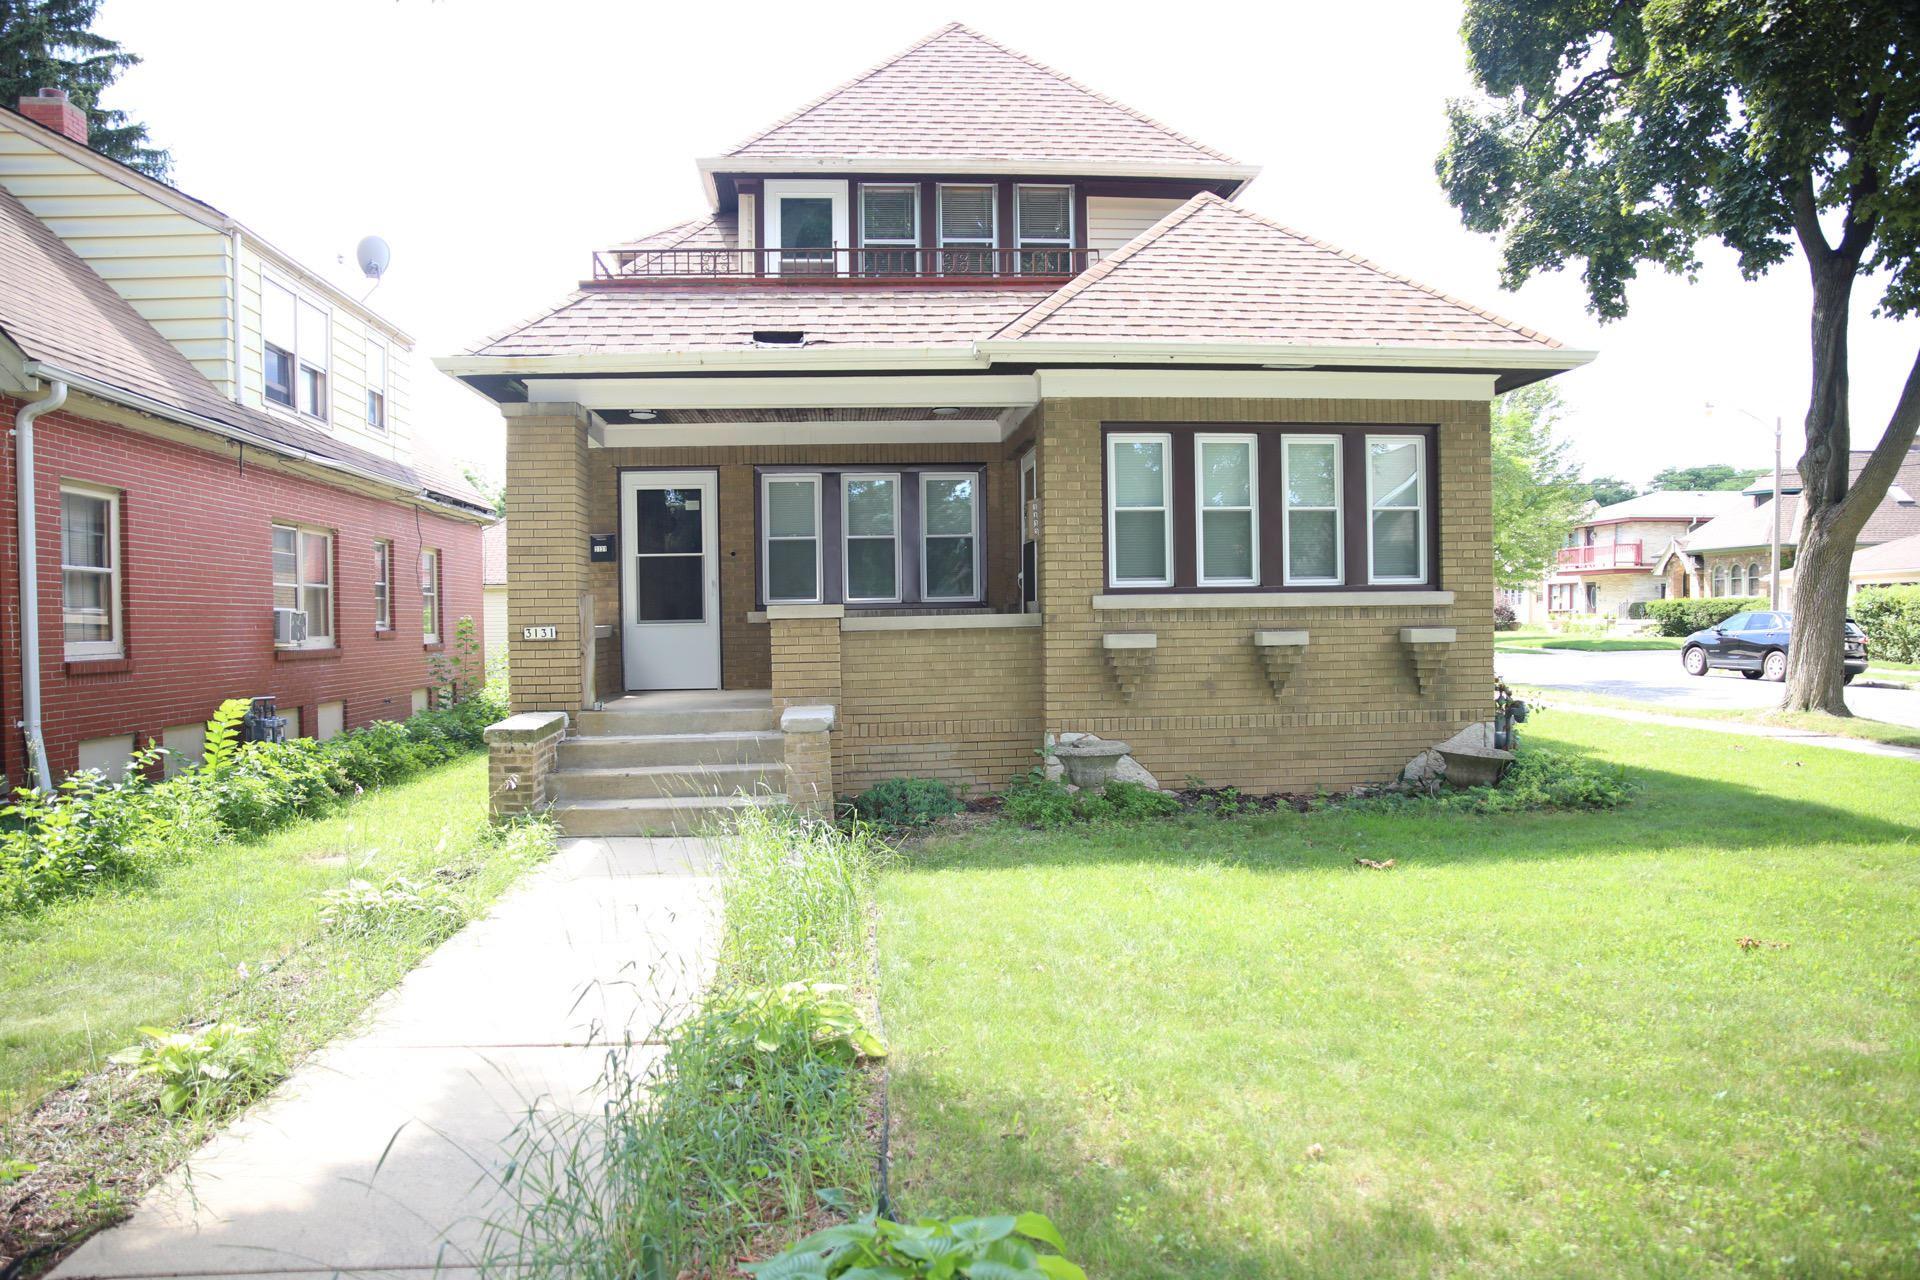 3131 N 46th St #3133, Milwaukee, WI 53216 - #: 1701317